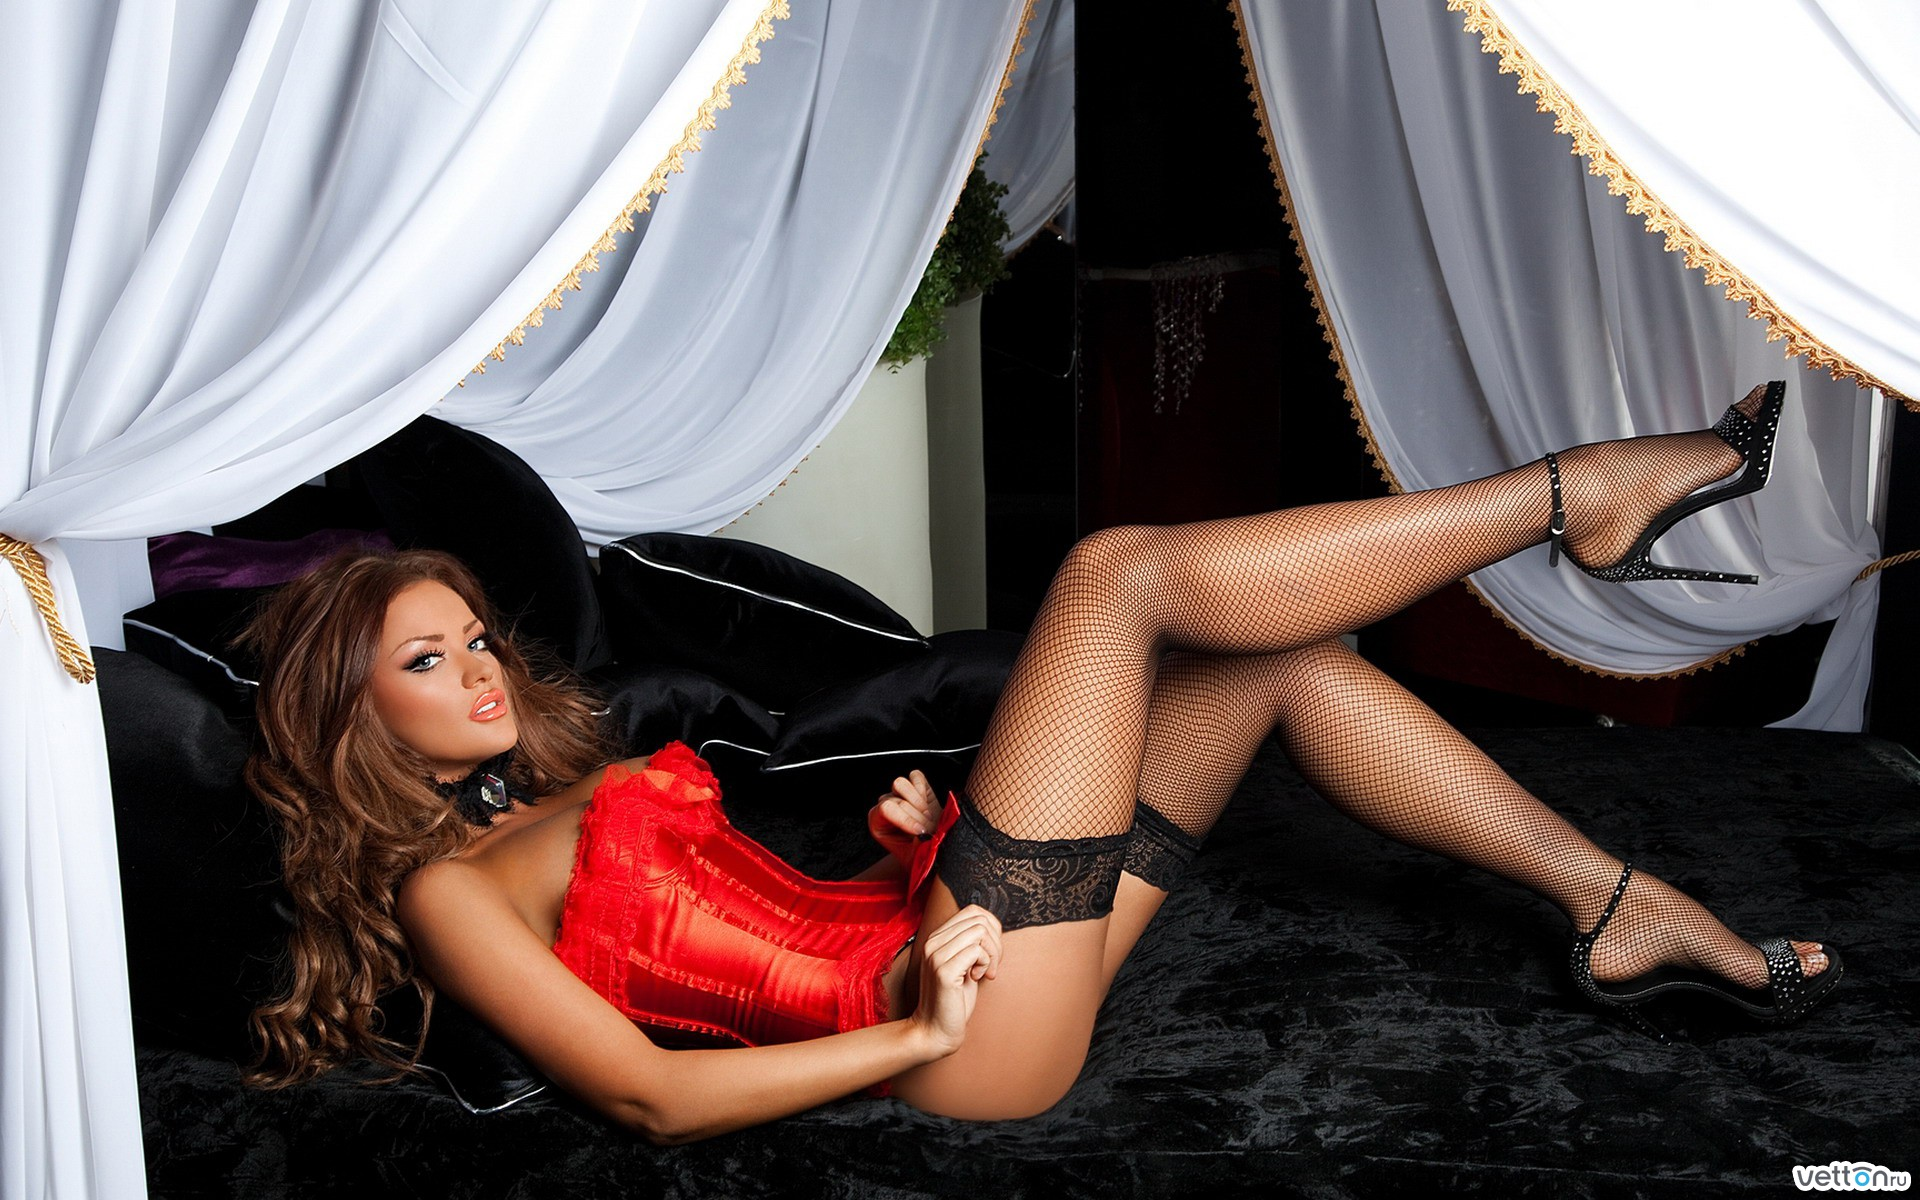 smotret-russkiy-seksi-video